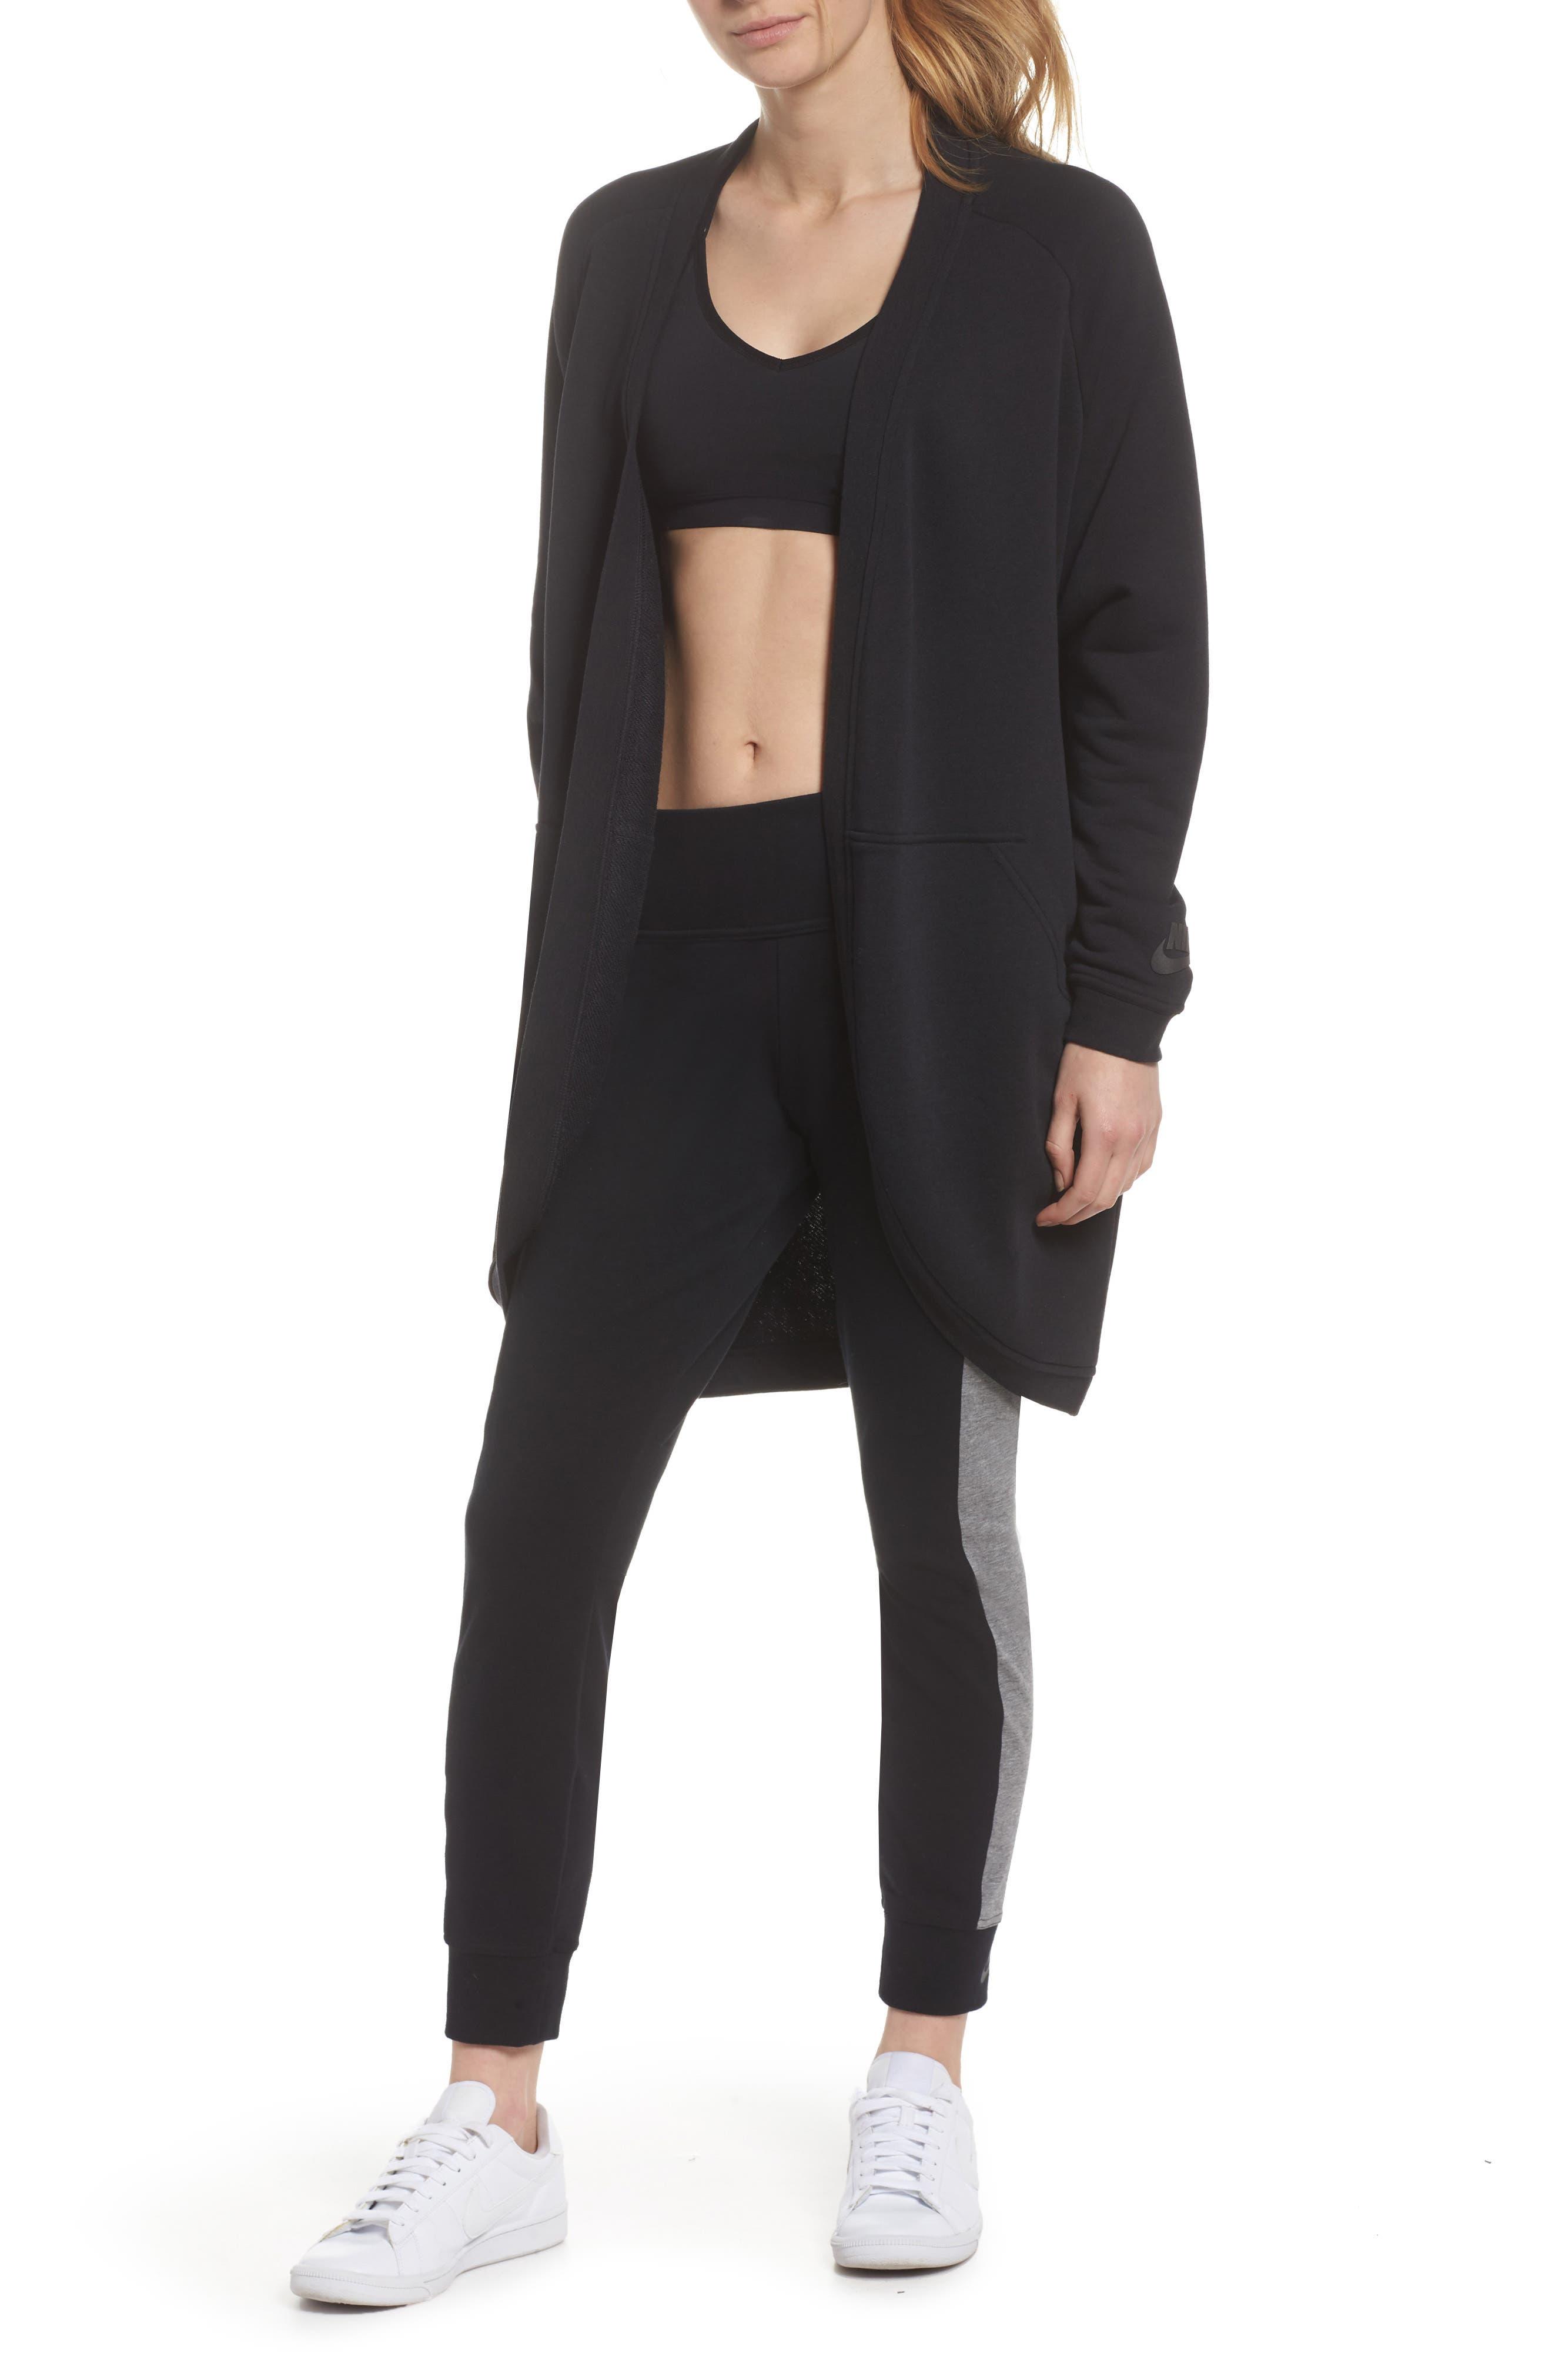 Nike Sportswear Modern Cardigan